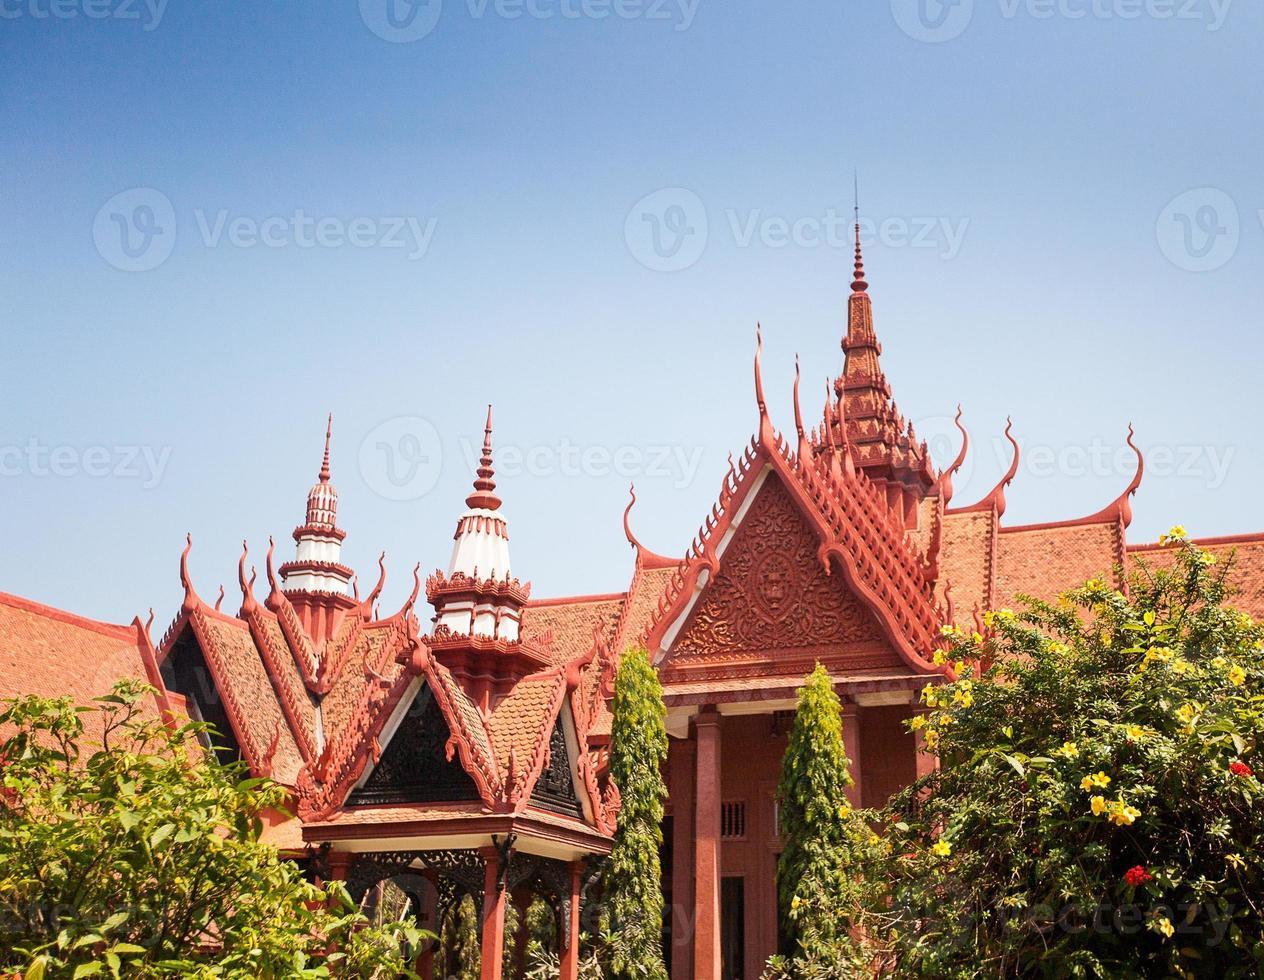 le musée national du cambodge (sala rachana) phnom penh, cambo photo